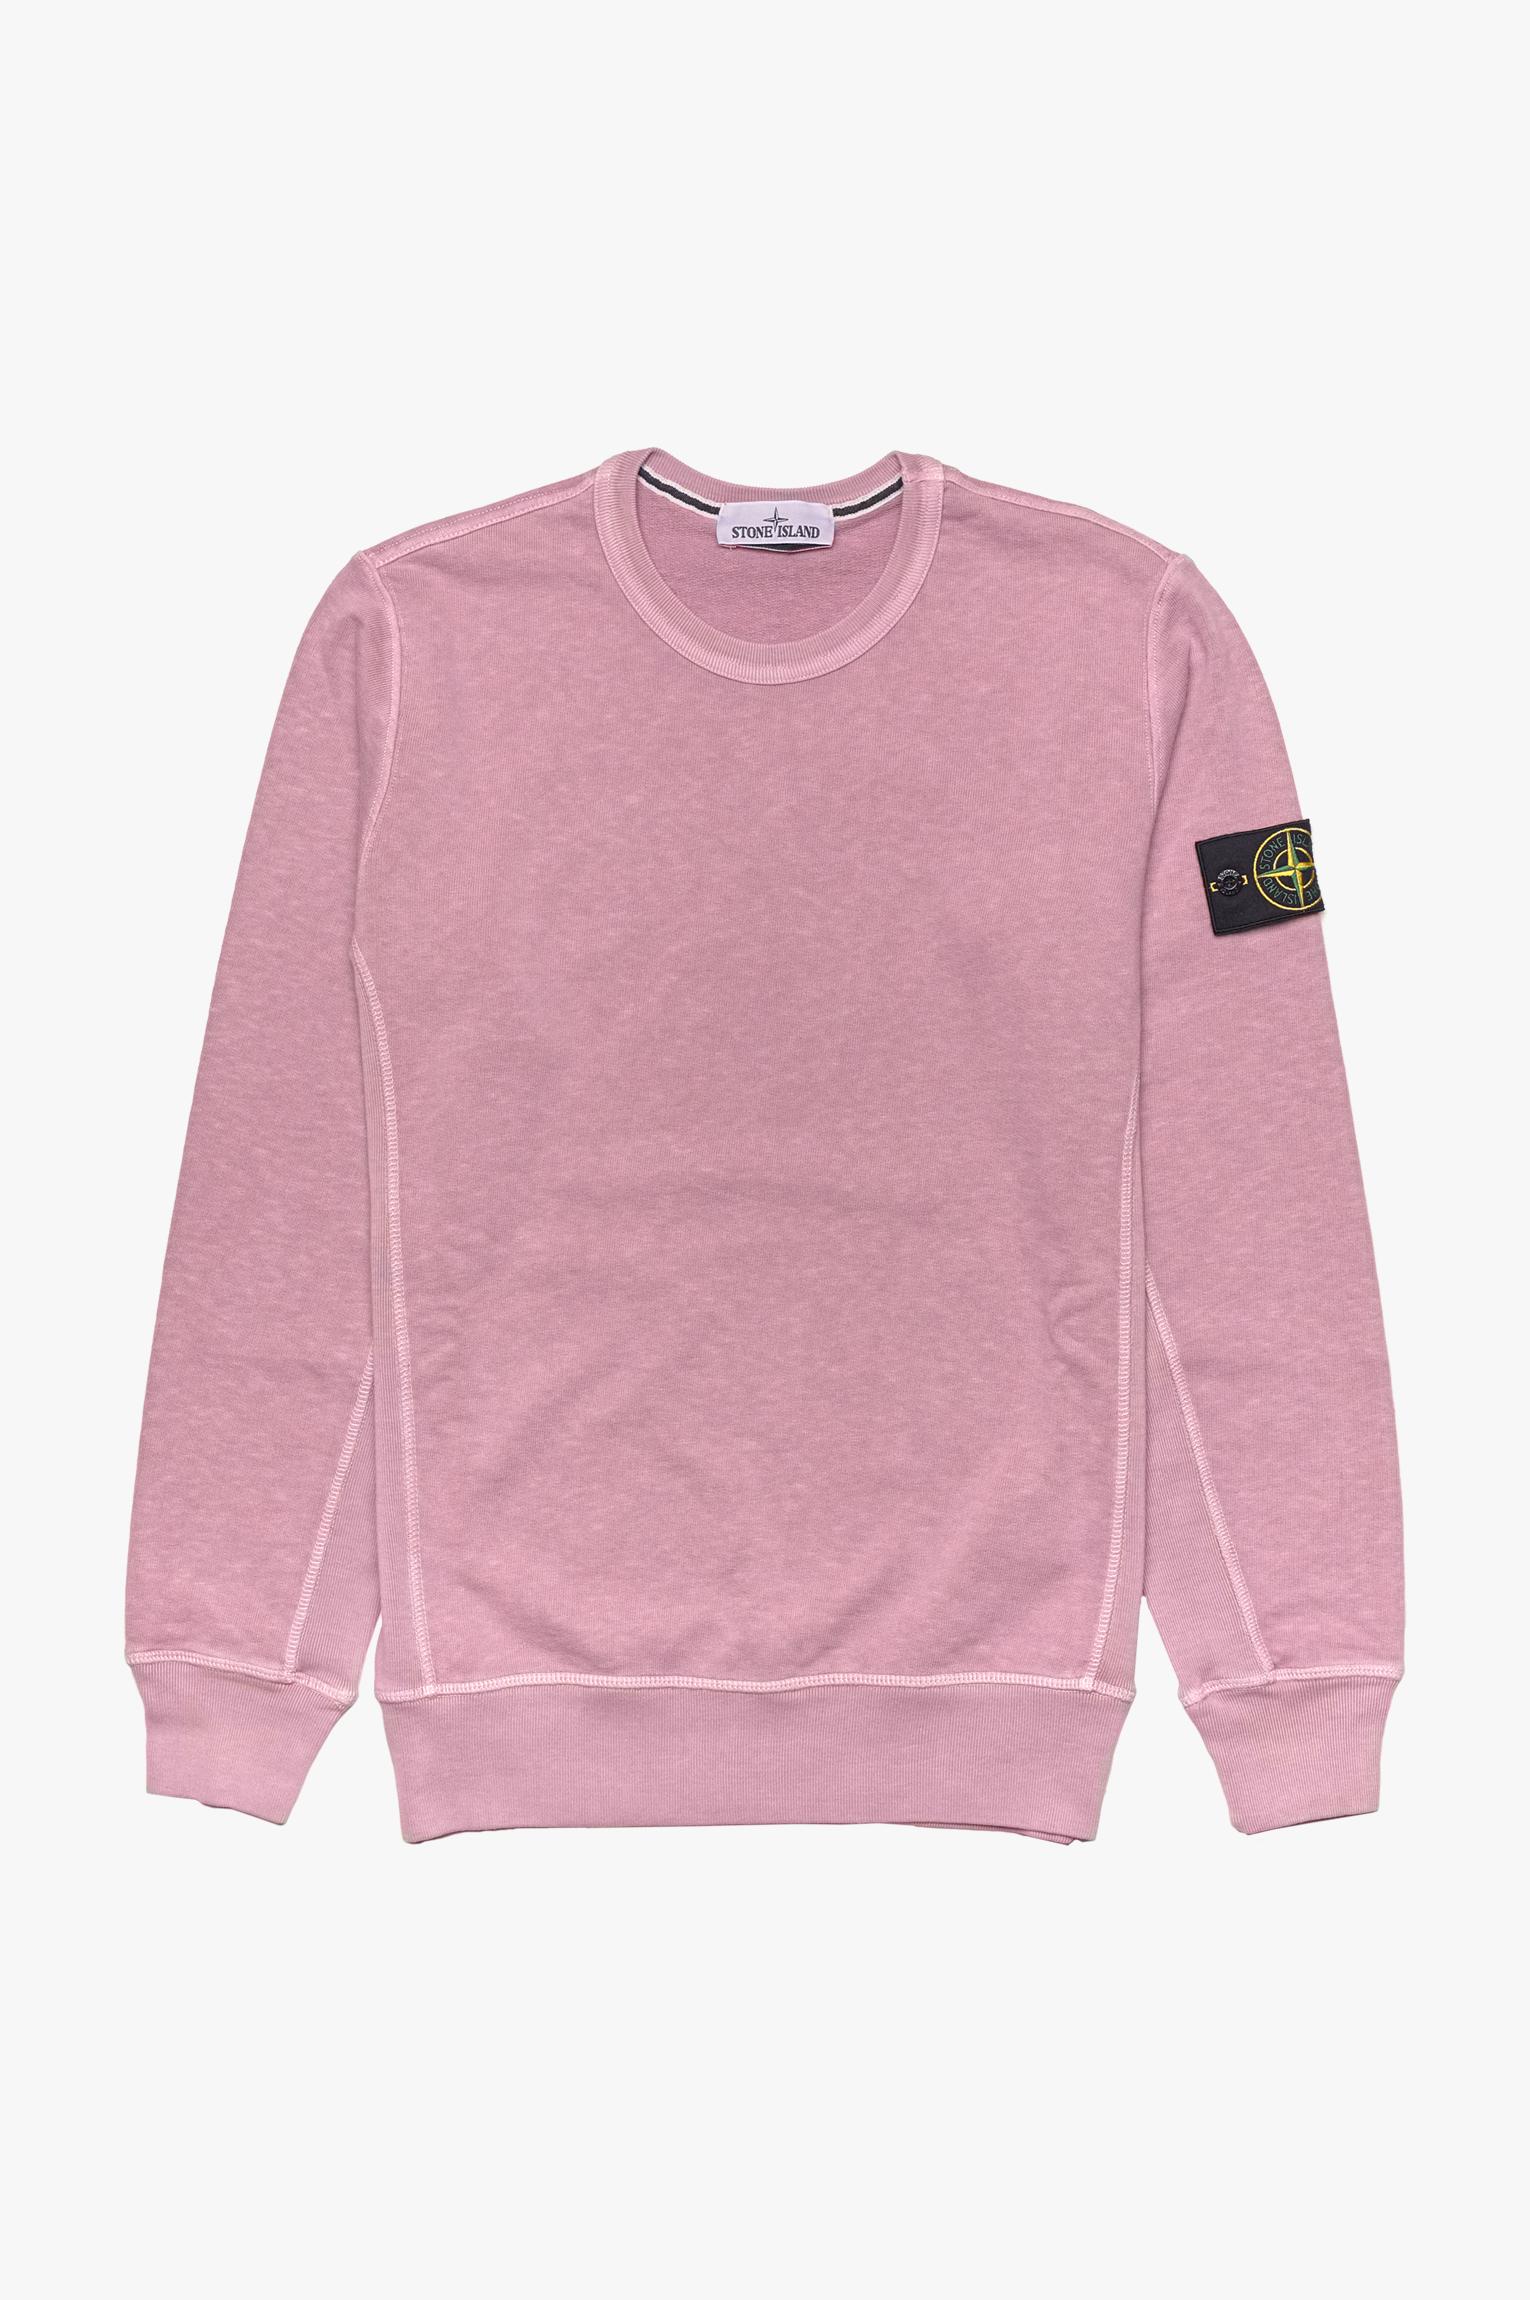 Washed Sweatshirt Pink